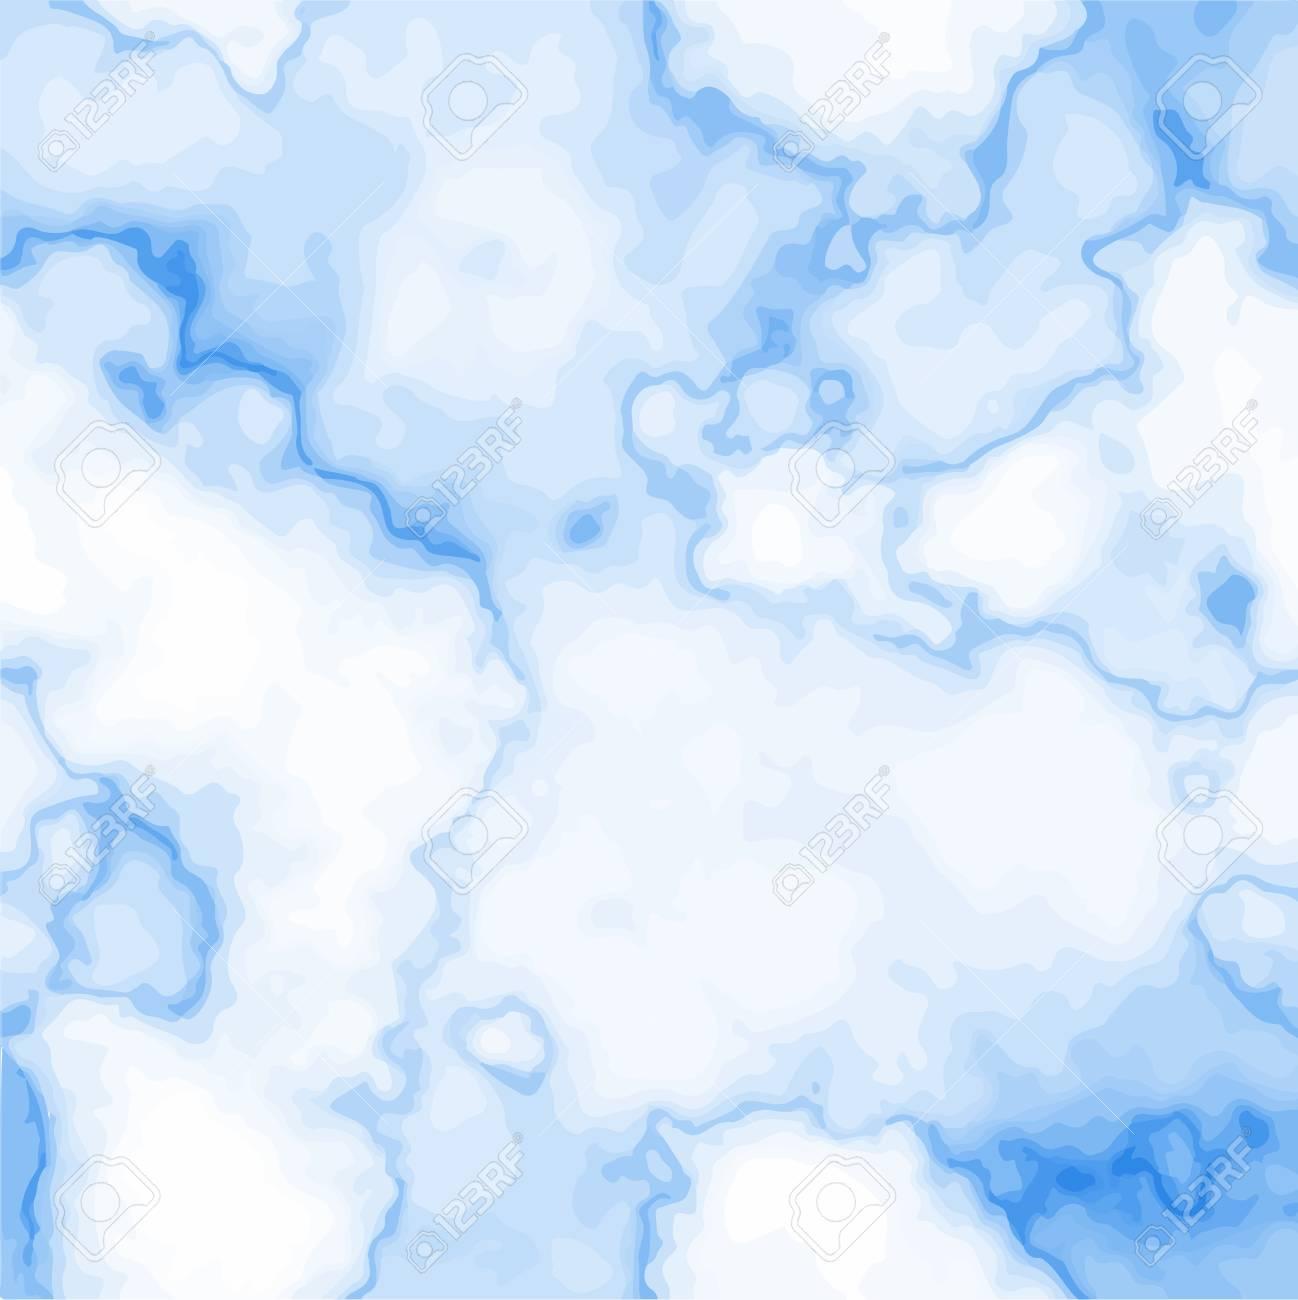 Vettoriale Struttura Di Marmo Blu Per Brochure Identità Aziendale